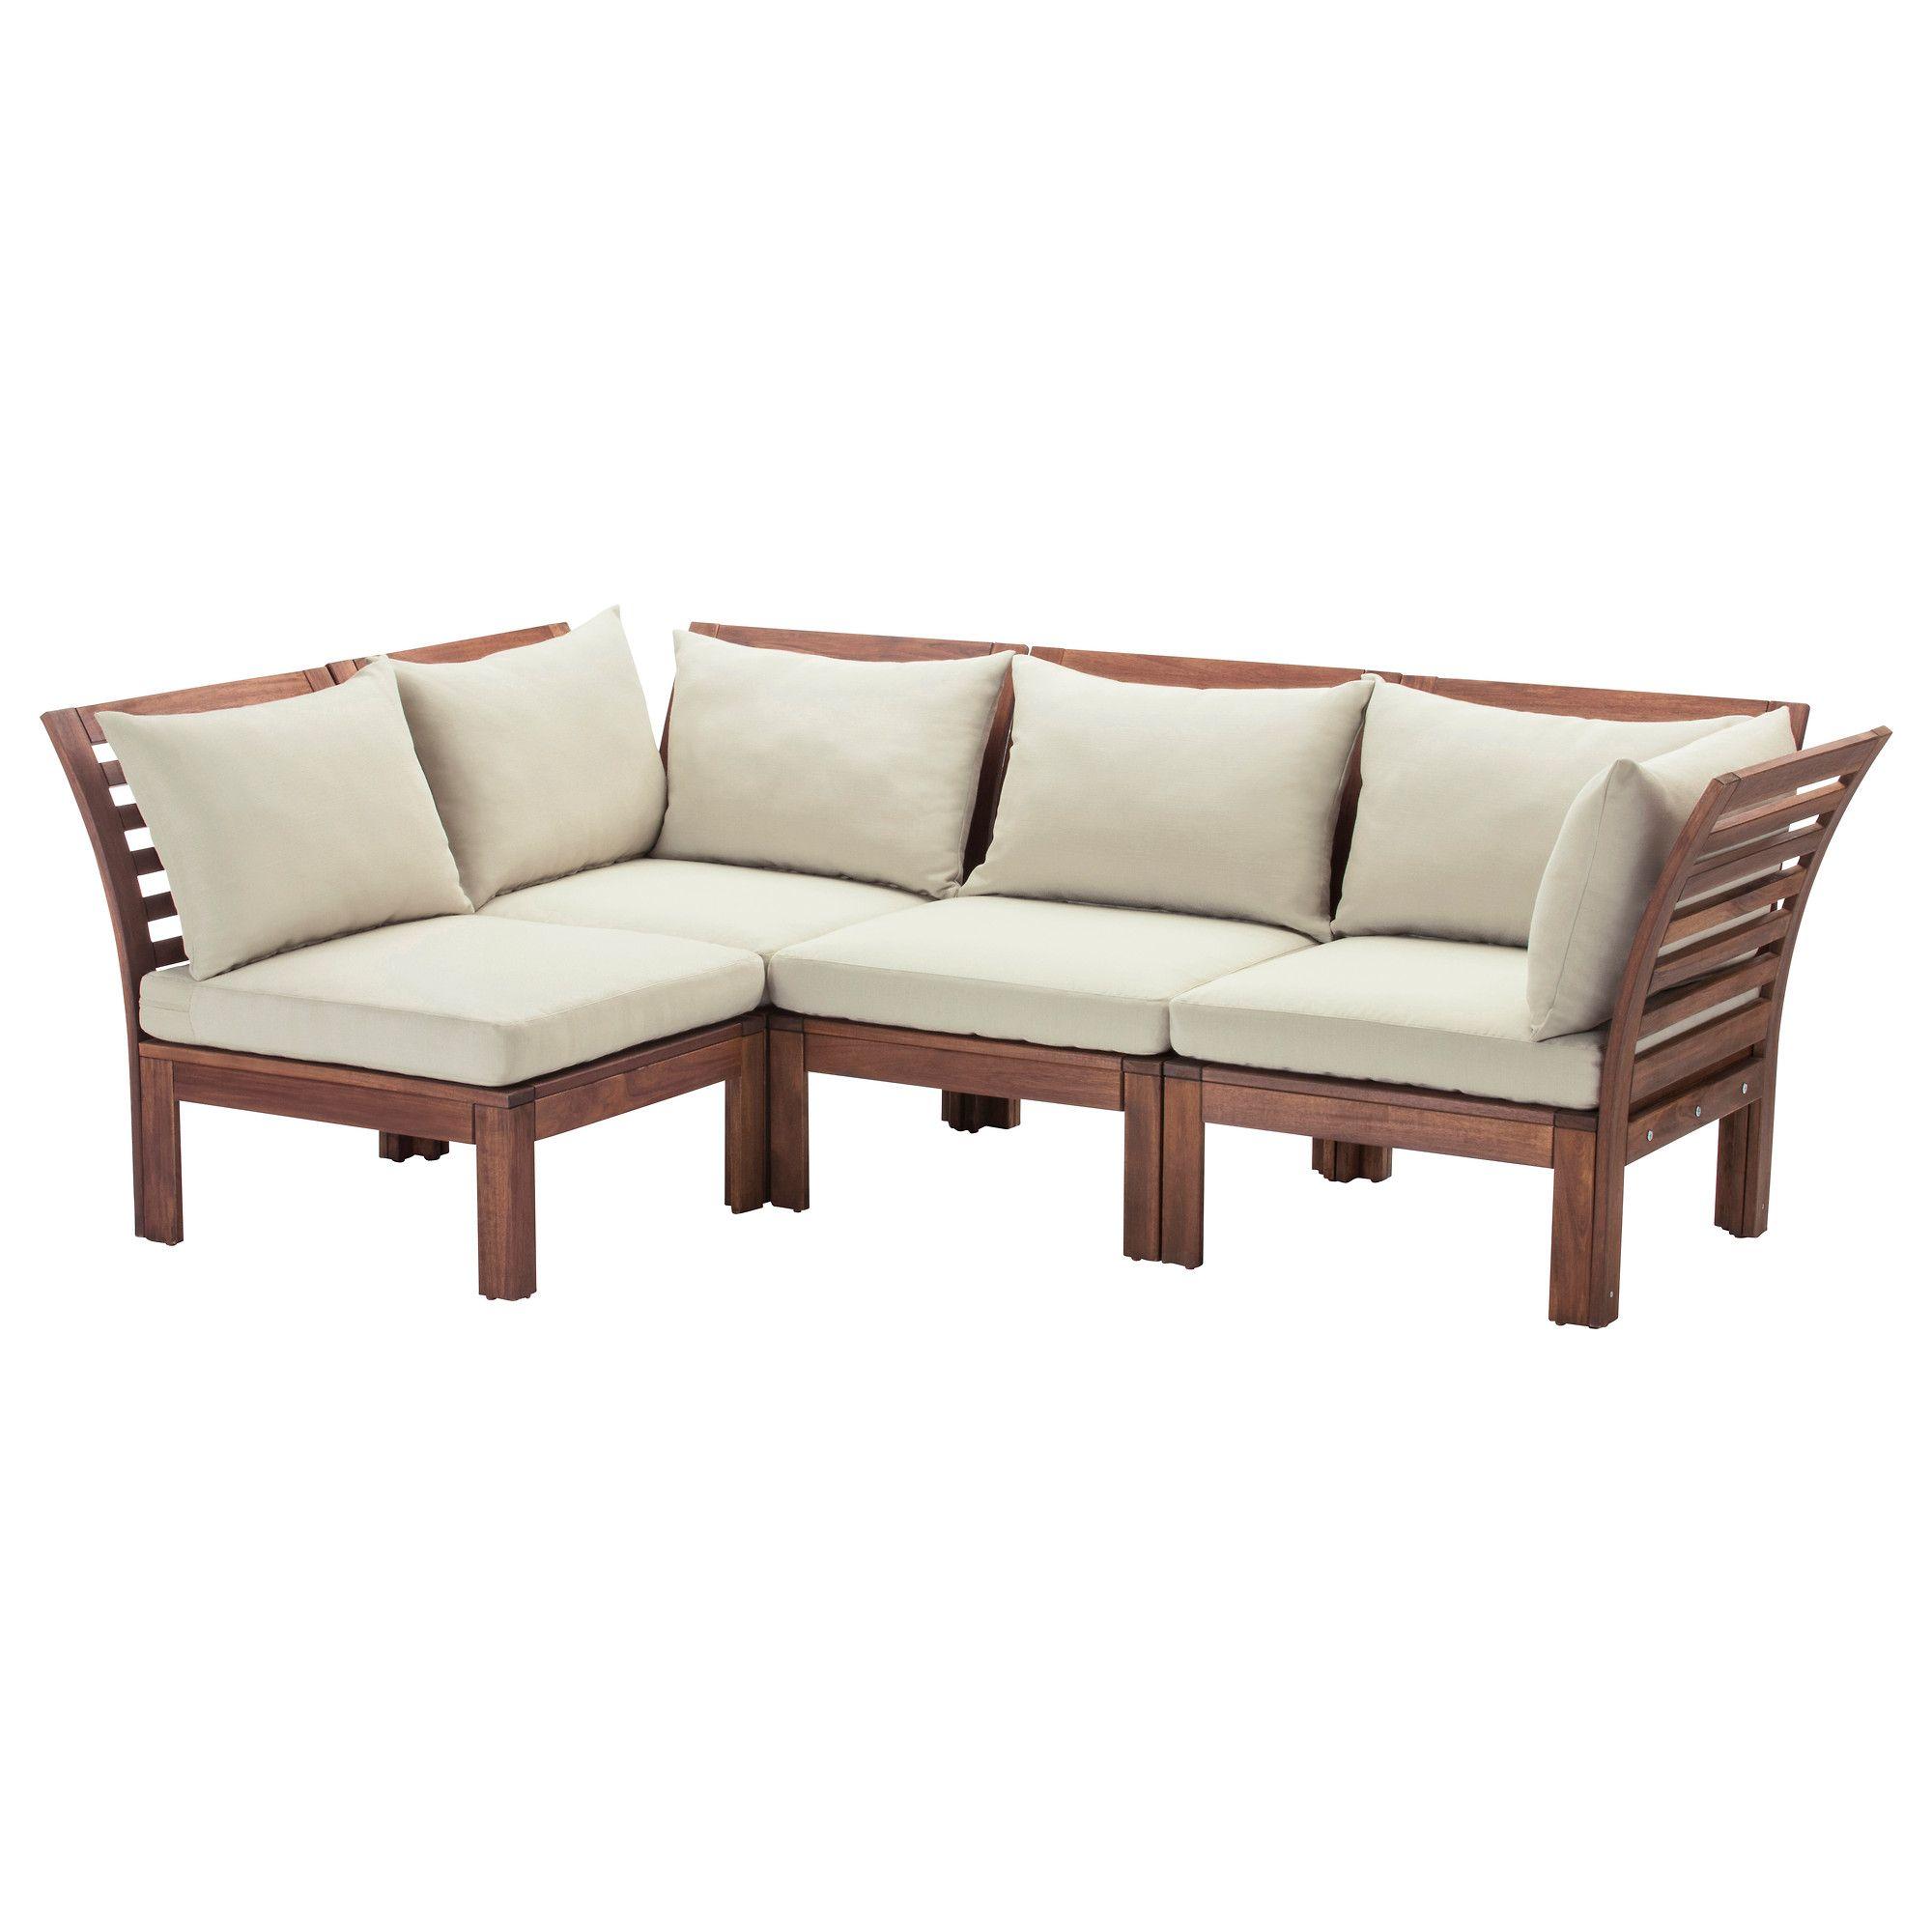 äpplarö 4 seat sectional outdoor brown brown stained beige